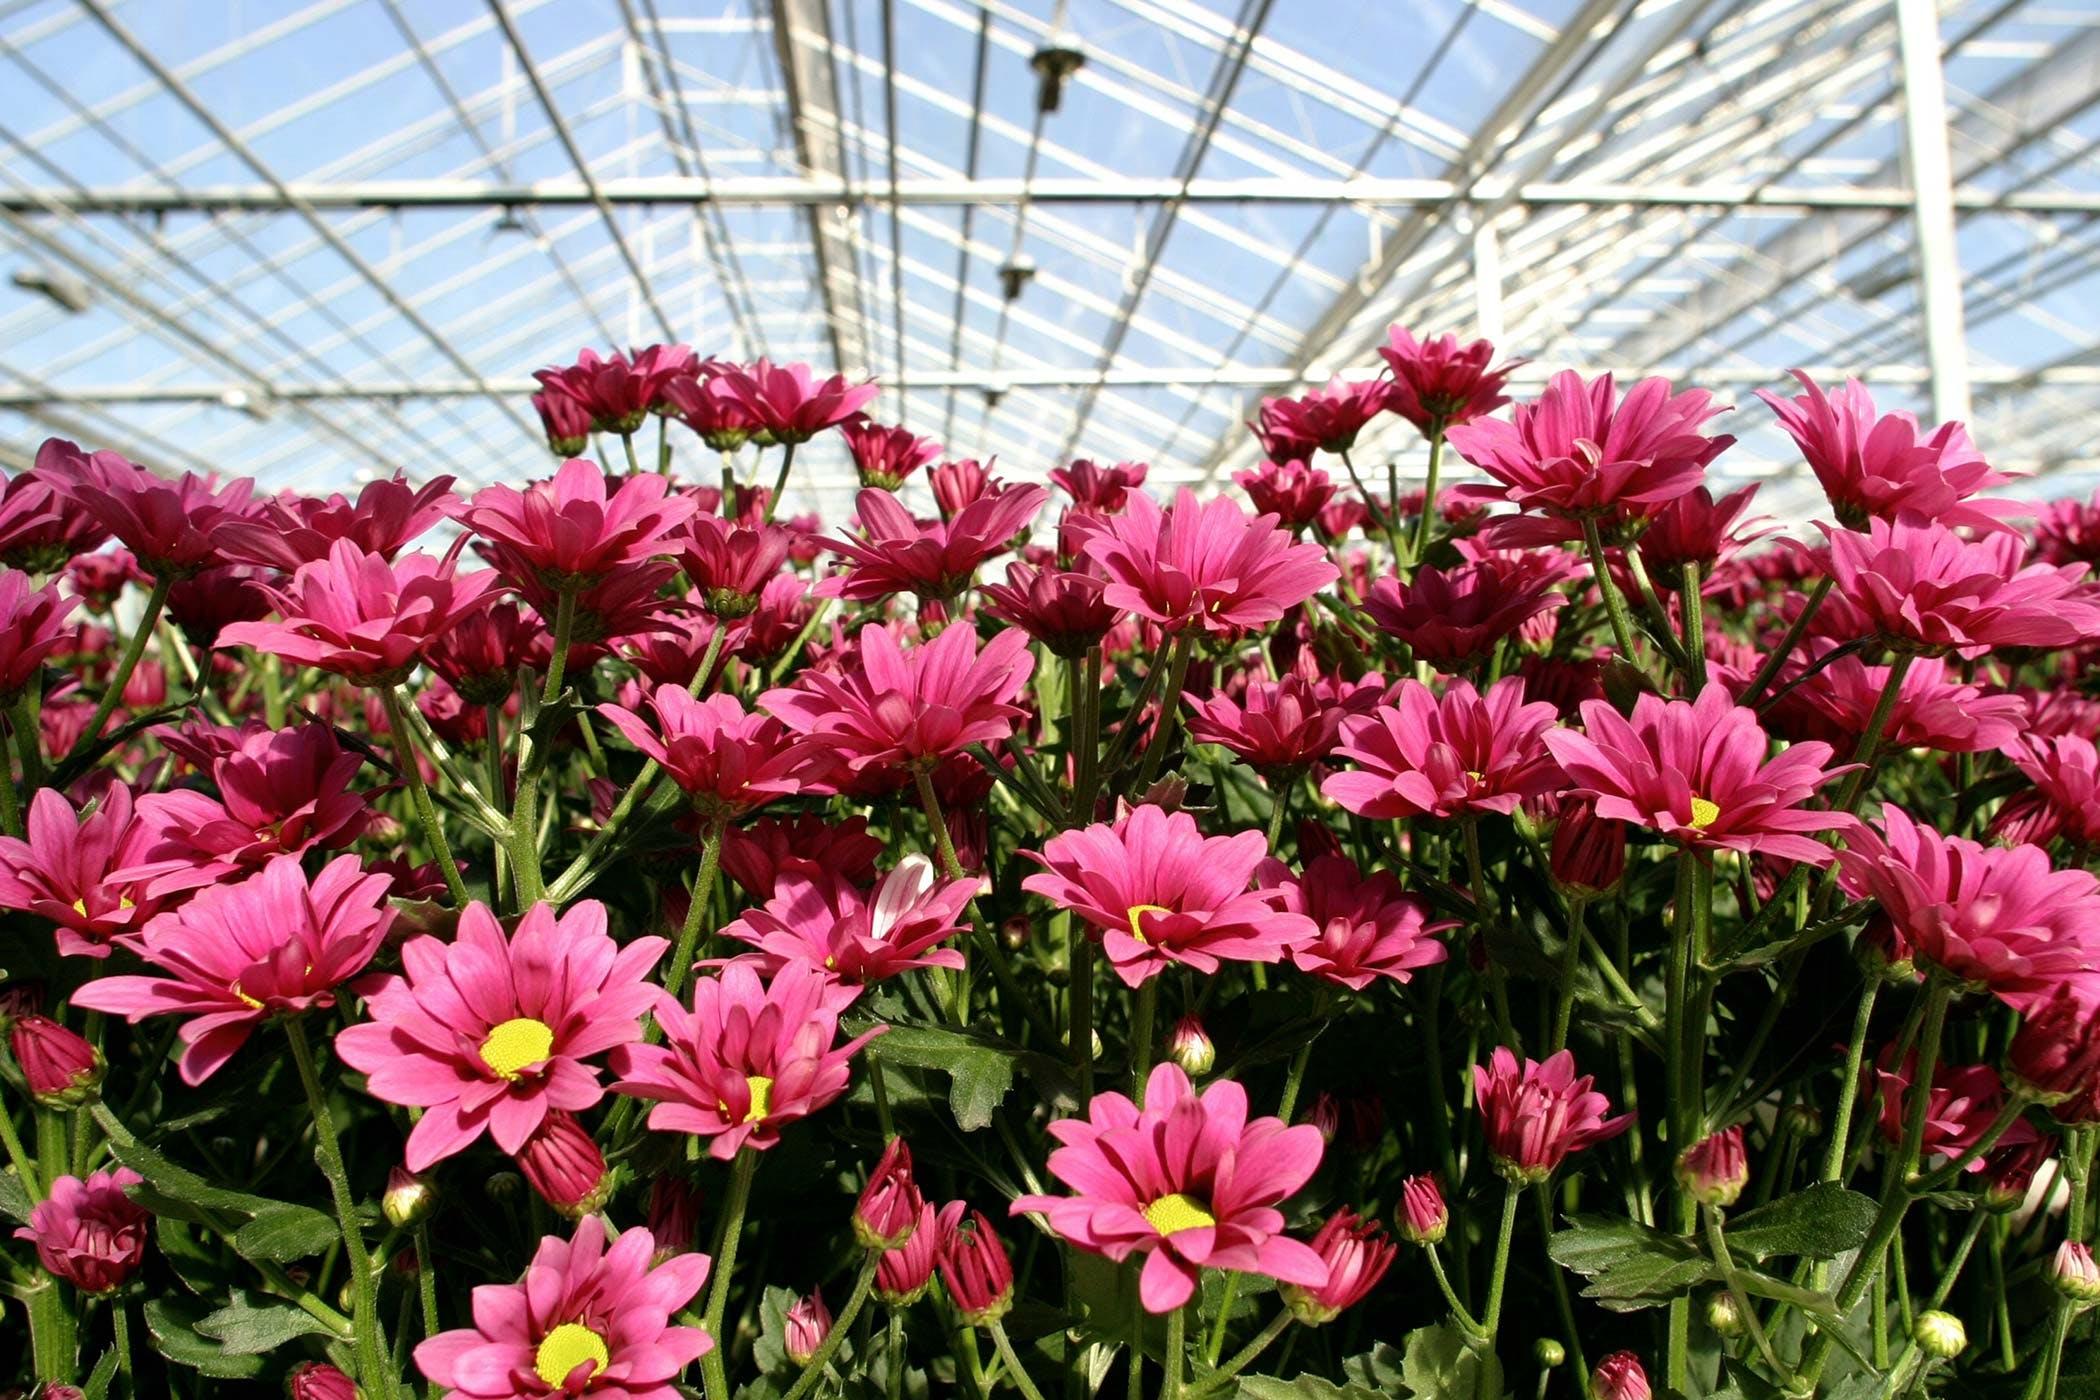 Chrysanthemum Poisoning in Dogs